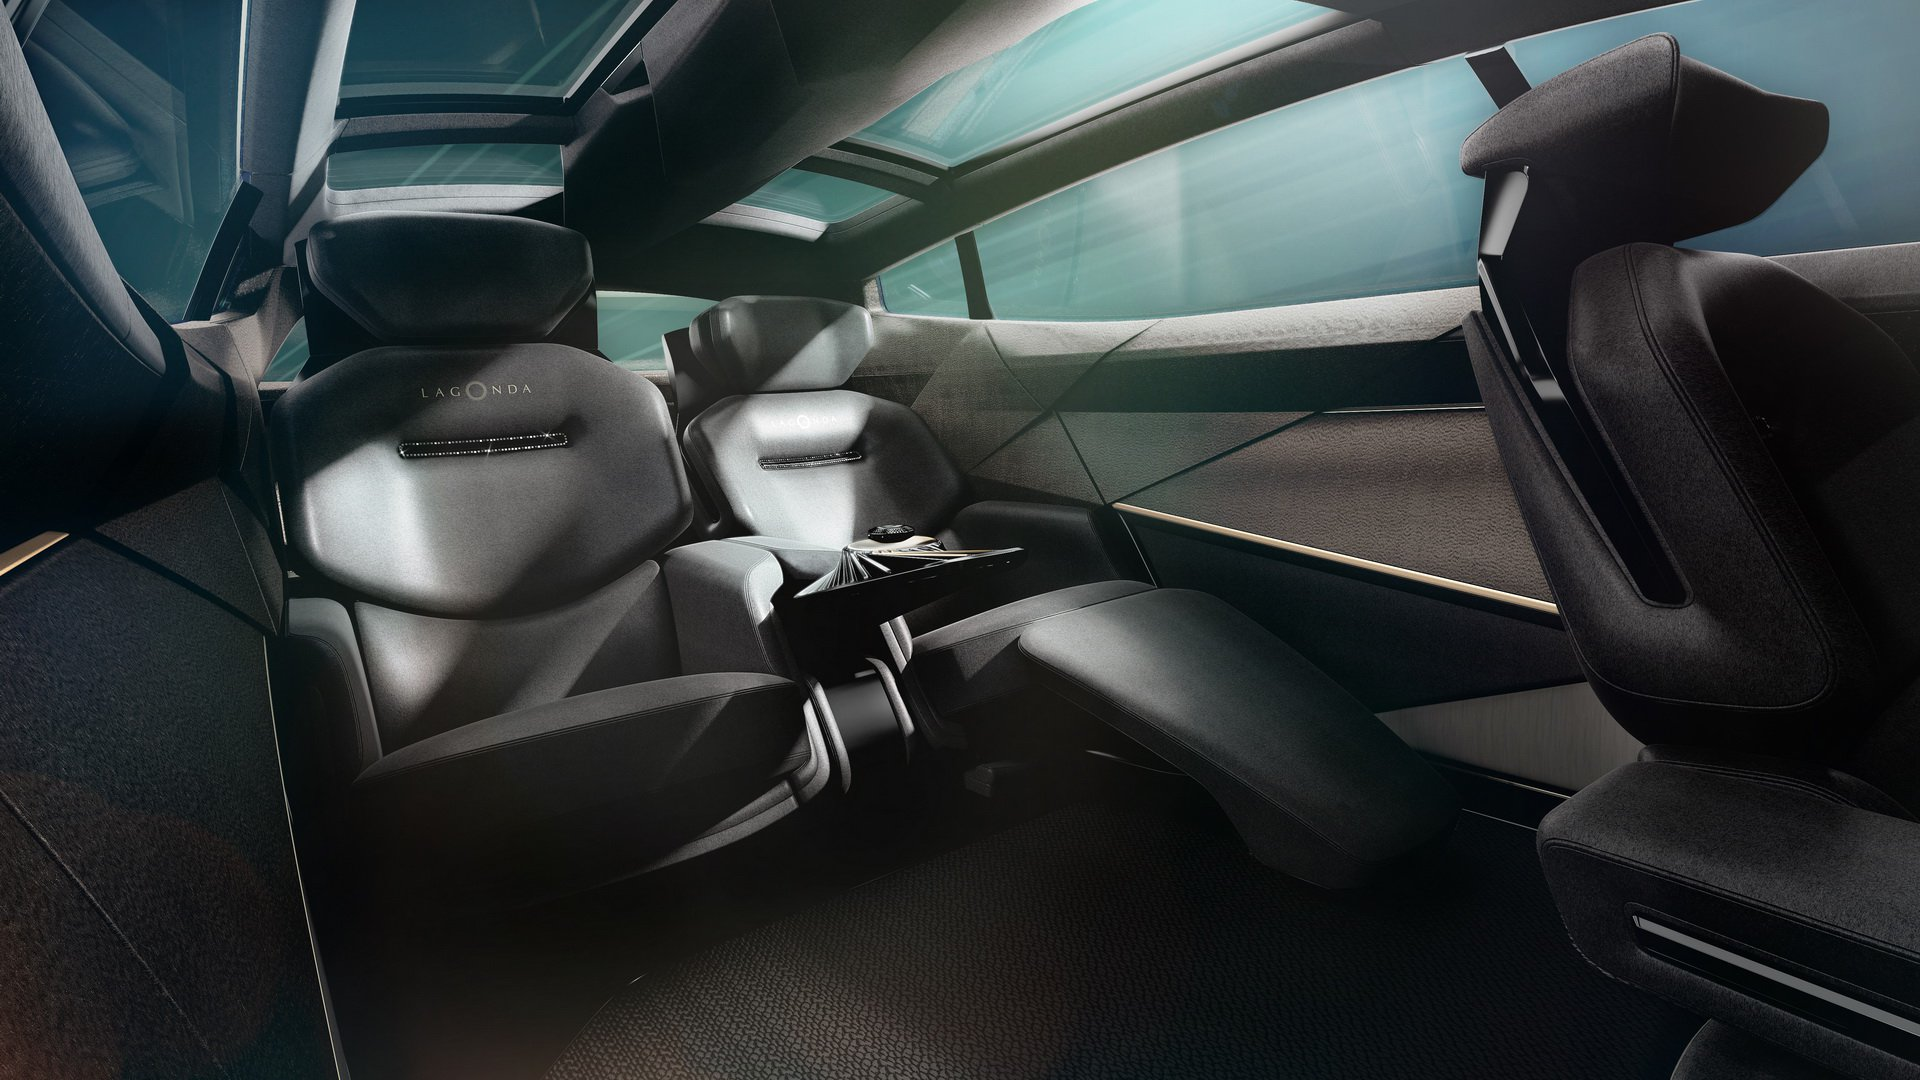 Lagonda All-Terrain Concept (5)